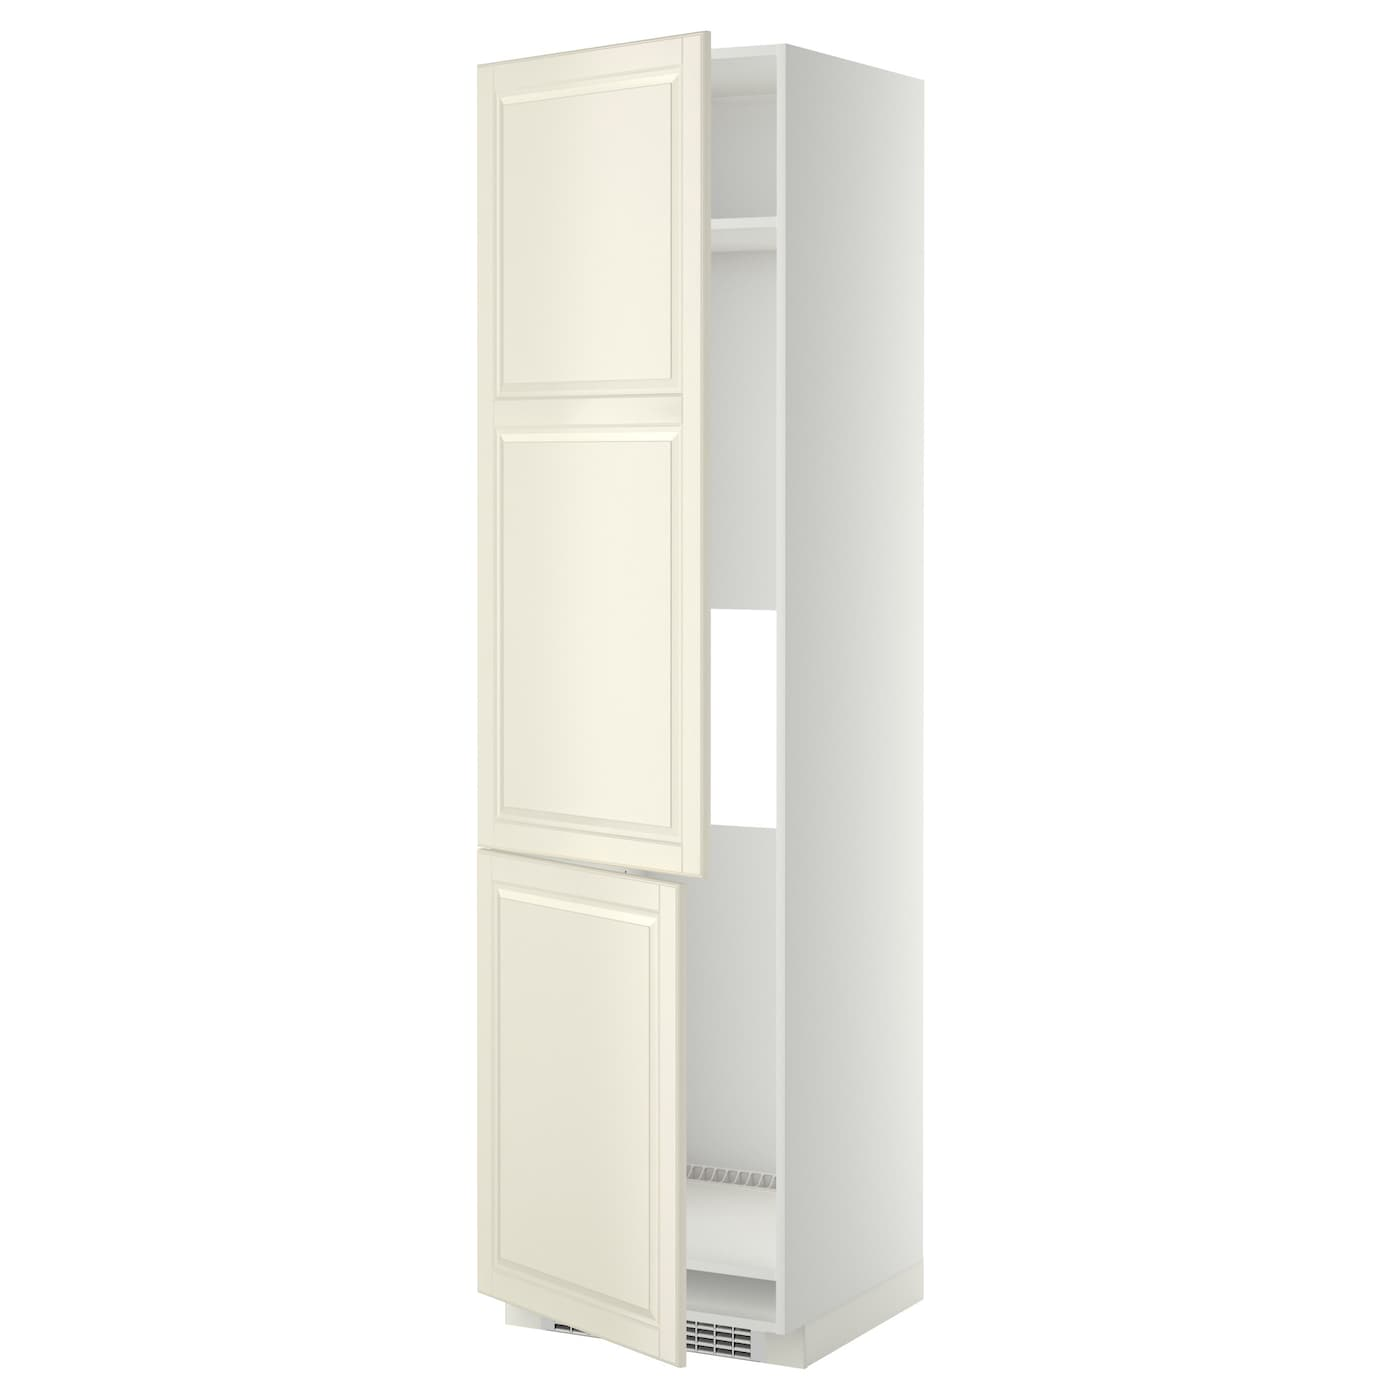 Metod high cab f fridge freezer w 2 doors white bodbyn off for Ikea battiscopa